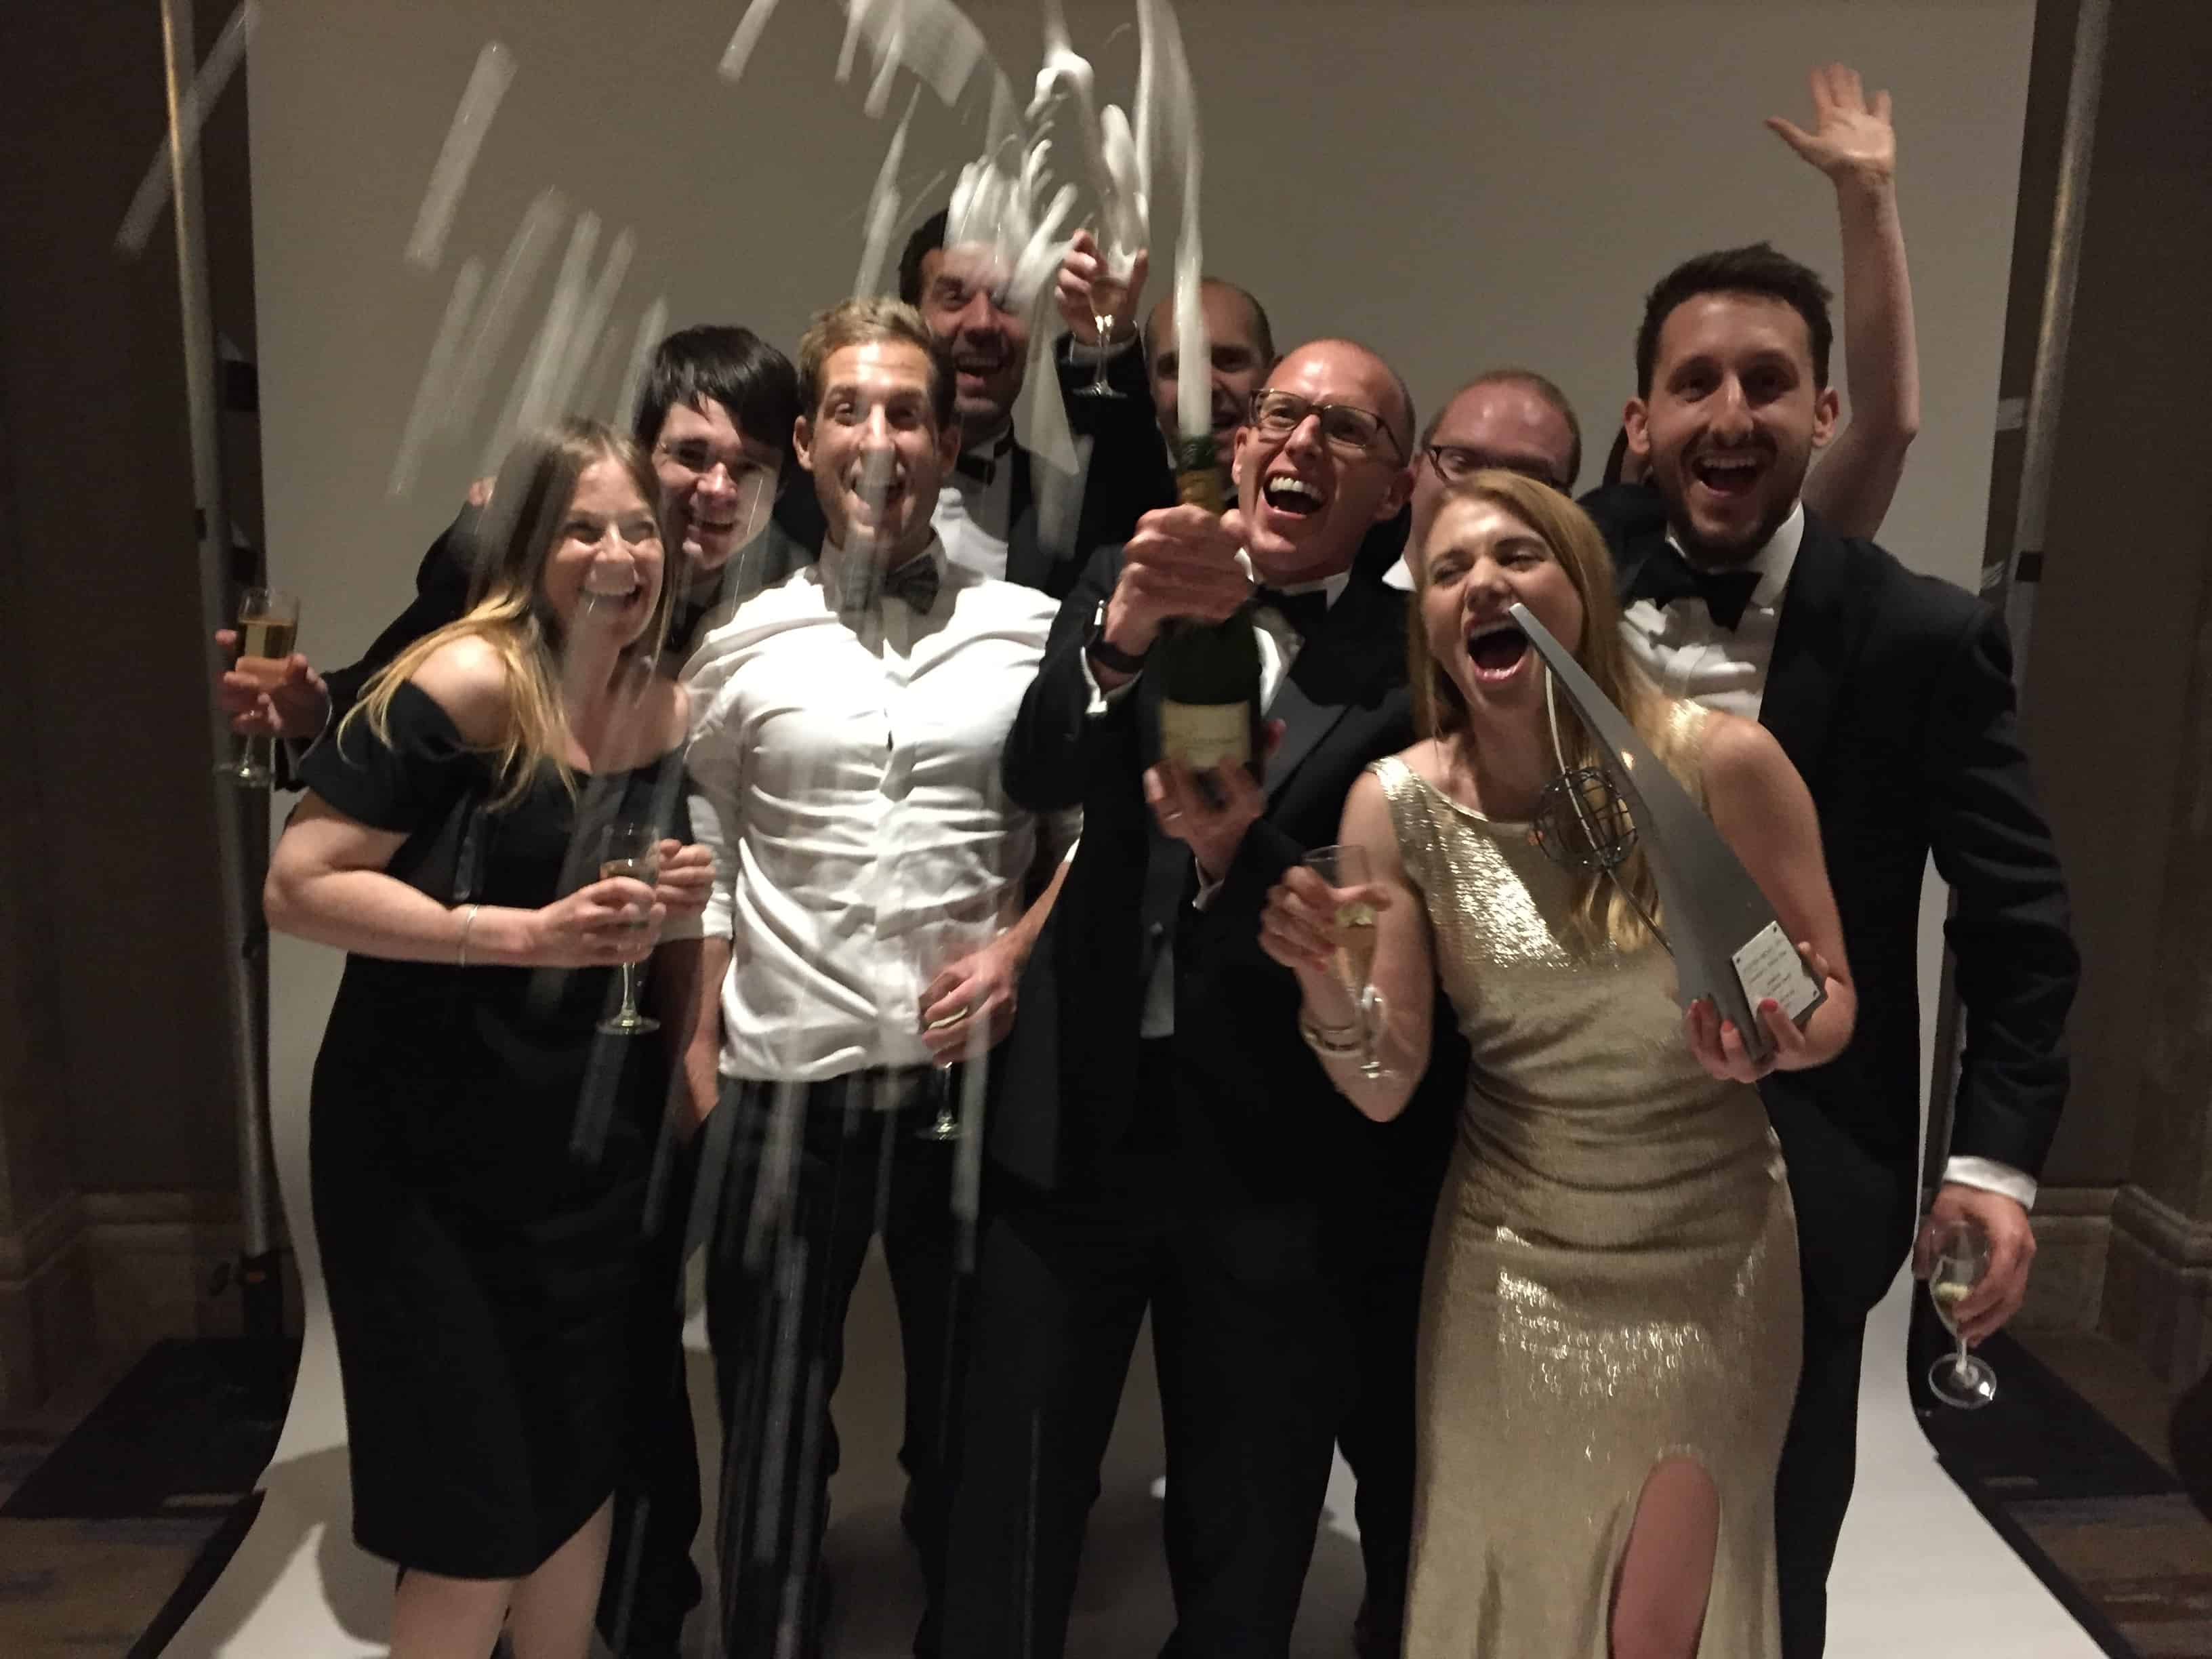 ForrestBrown celebrating Lisa-Marie Smith's Rising Star Award win 2017